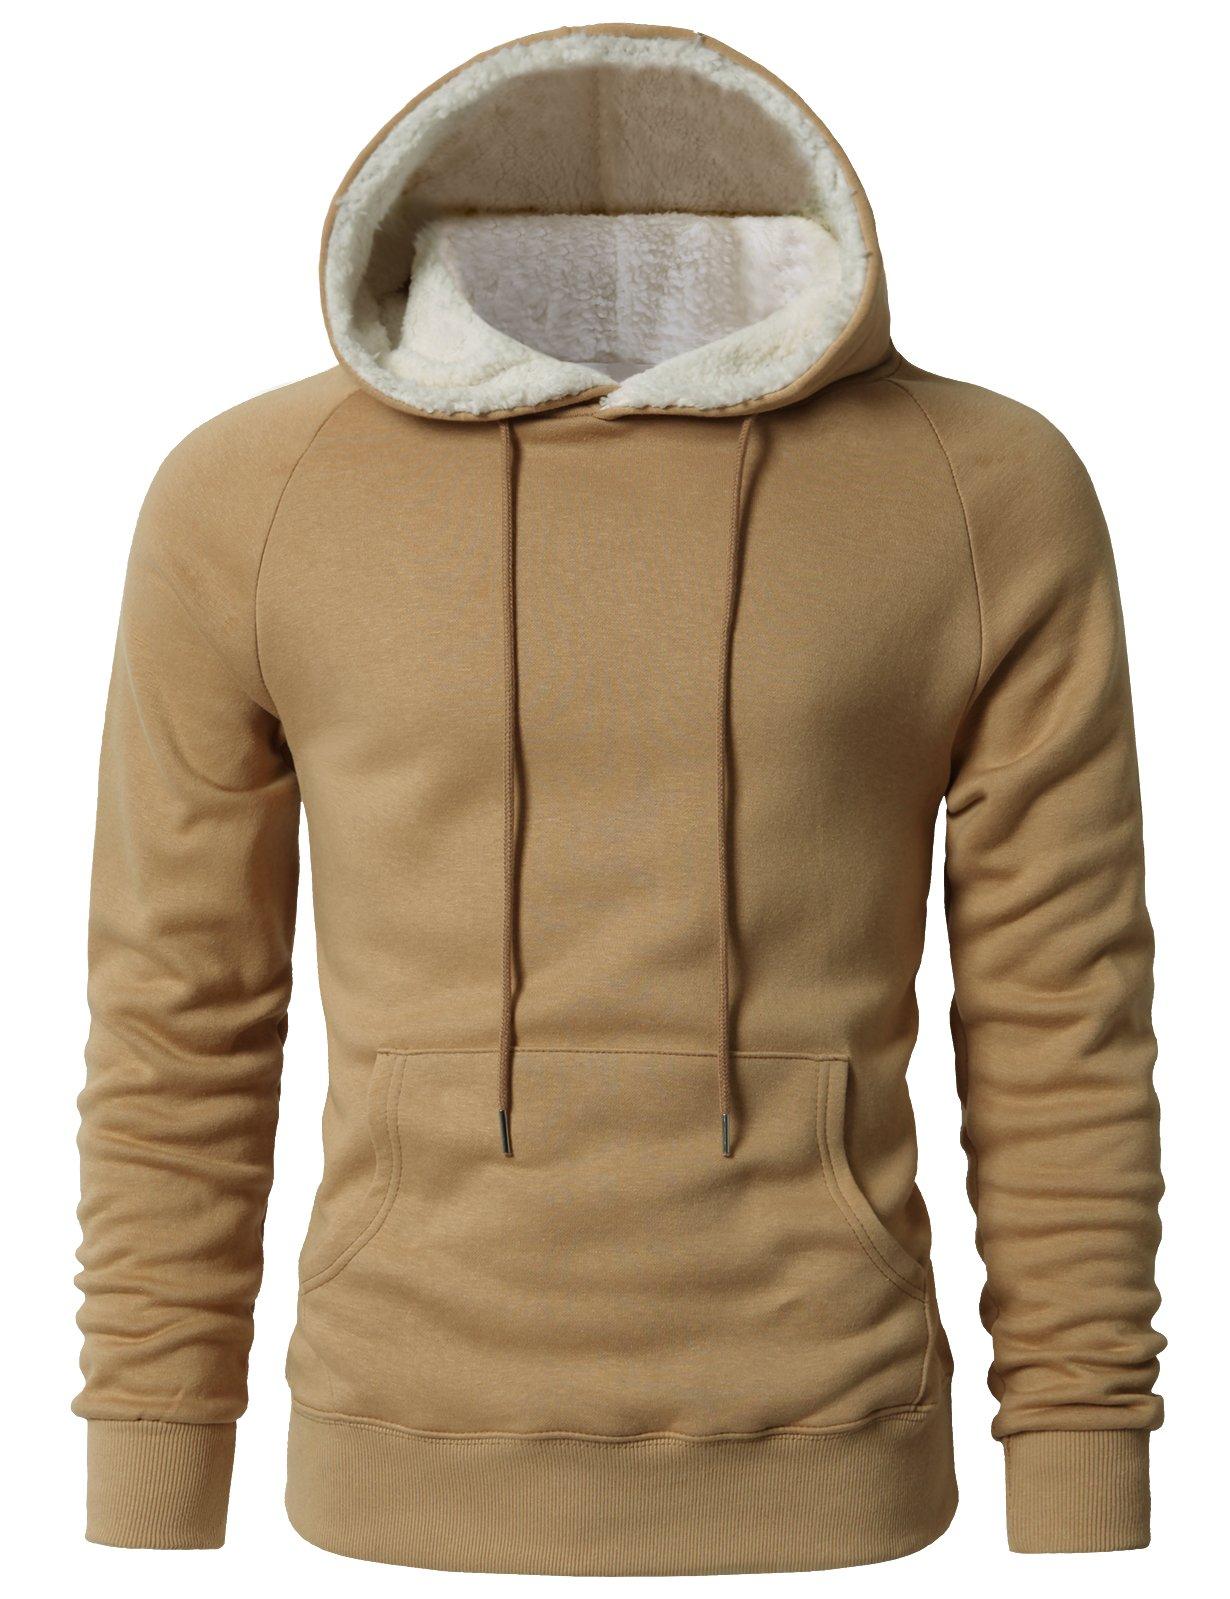 H2H Men's Fine Quality Plush Fleece Lined Pullover Beige US L/Asia XL (KMOHOL0126) by H2H (Image #2)